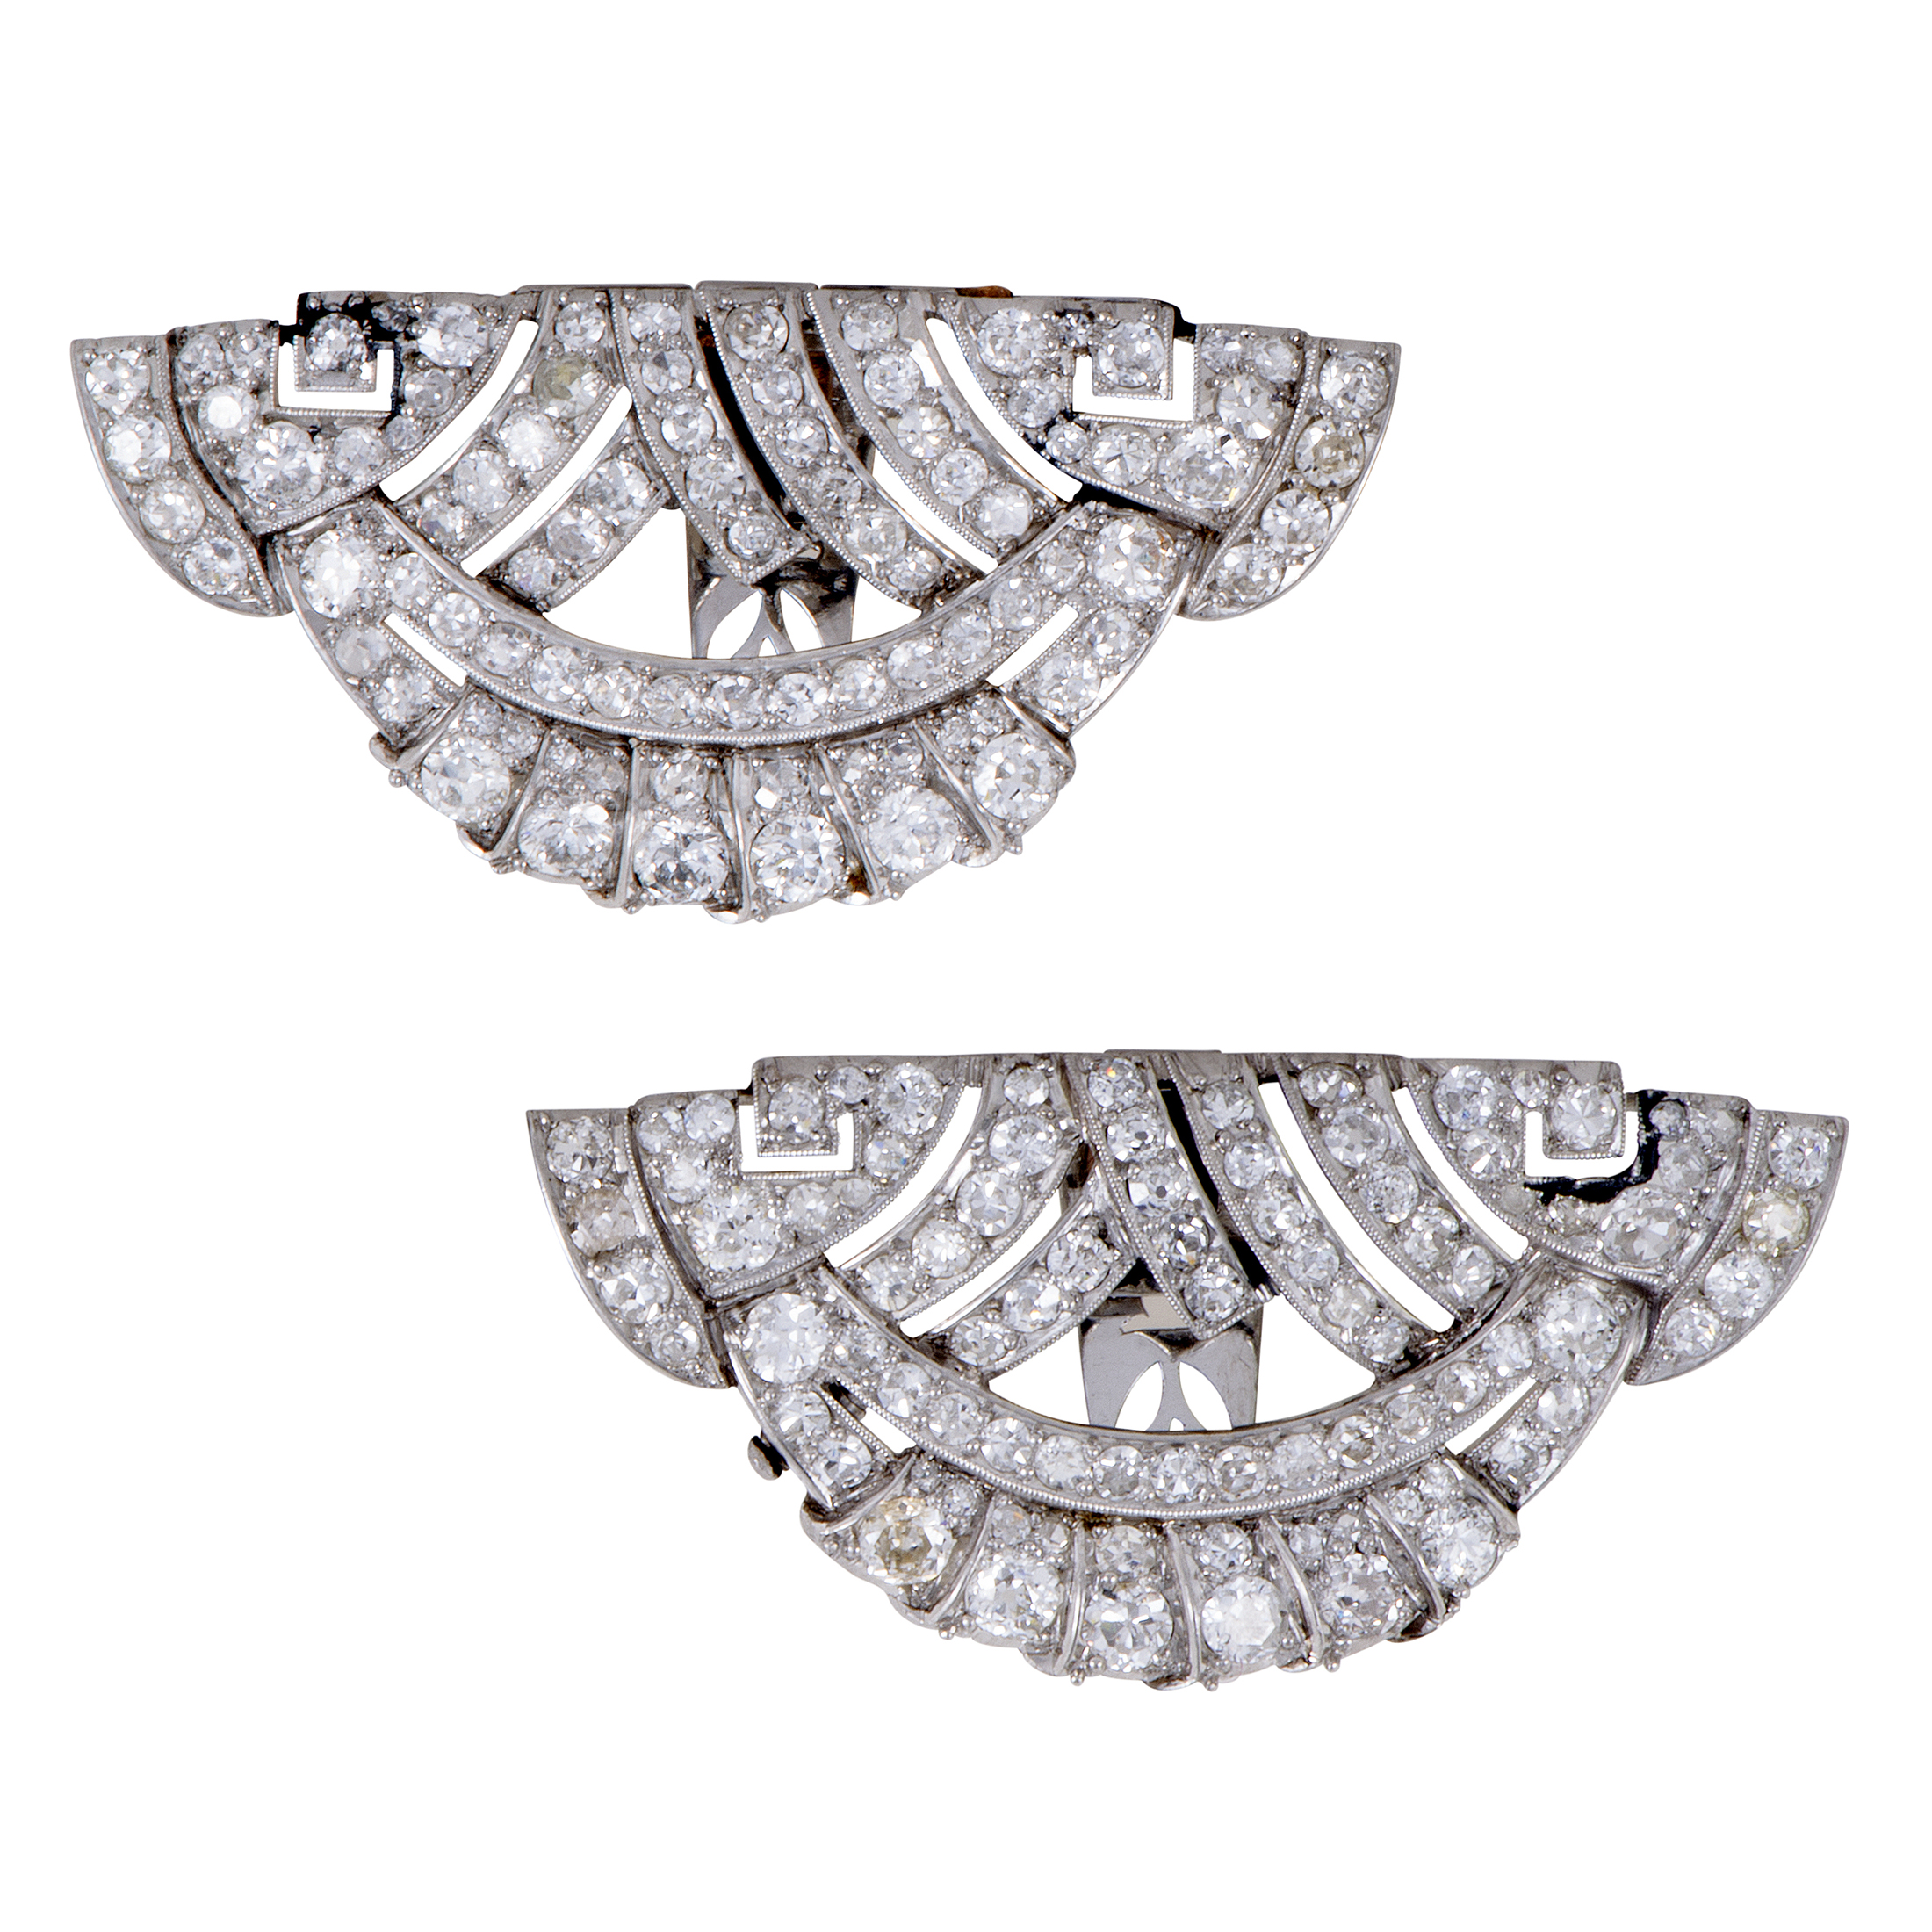 Antique Platinum Full Diamond Large Fan Clips